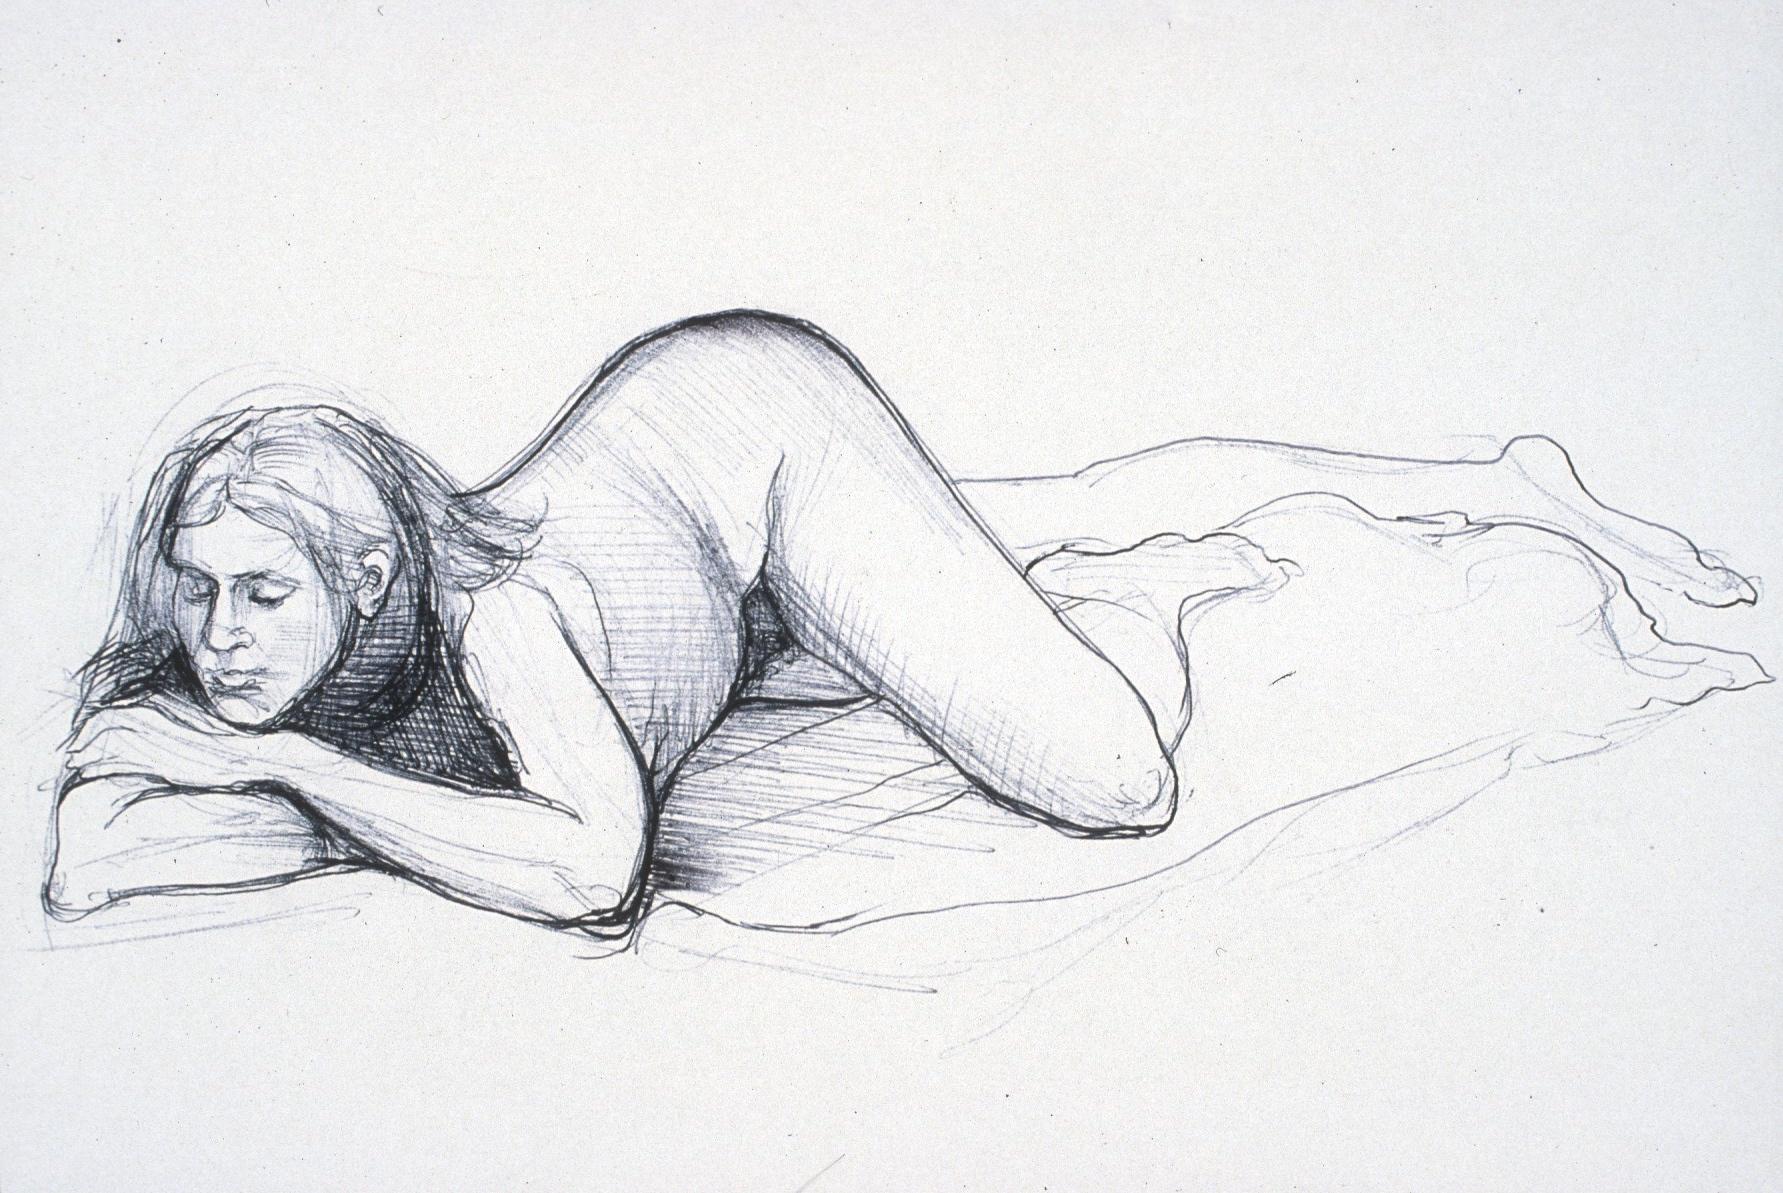 "Lou Ann Burkhardt  Untitled ,  2002 Pen and ink on paper 11"" x 14"" framed"